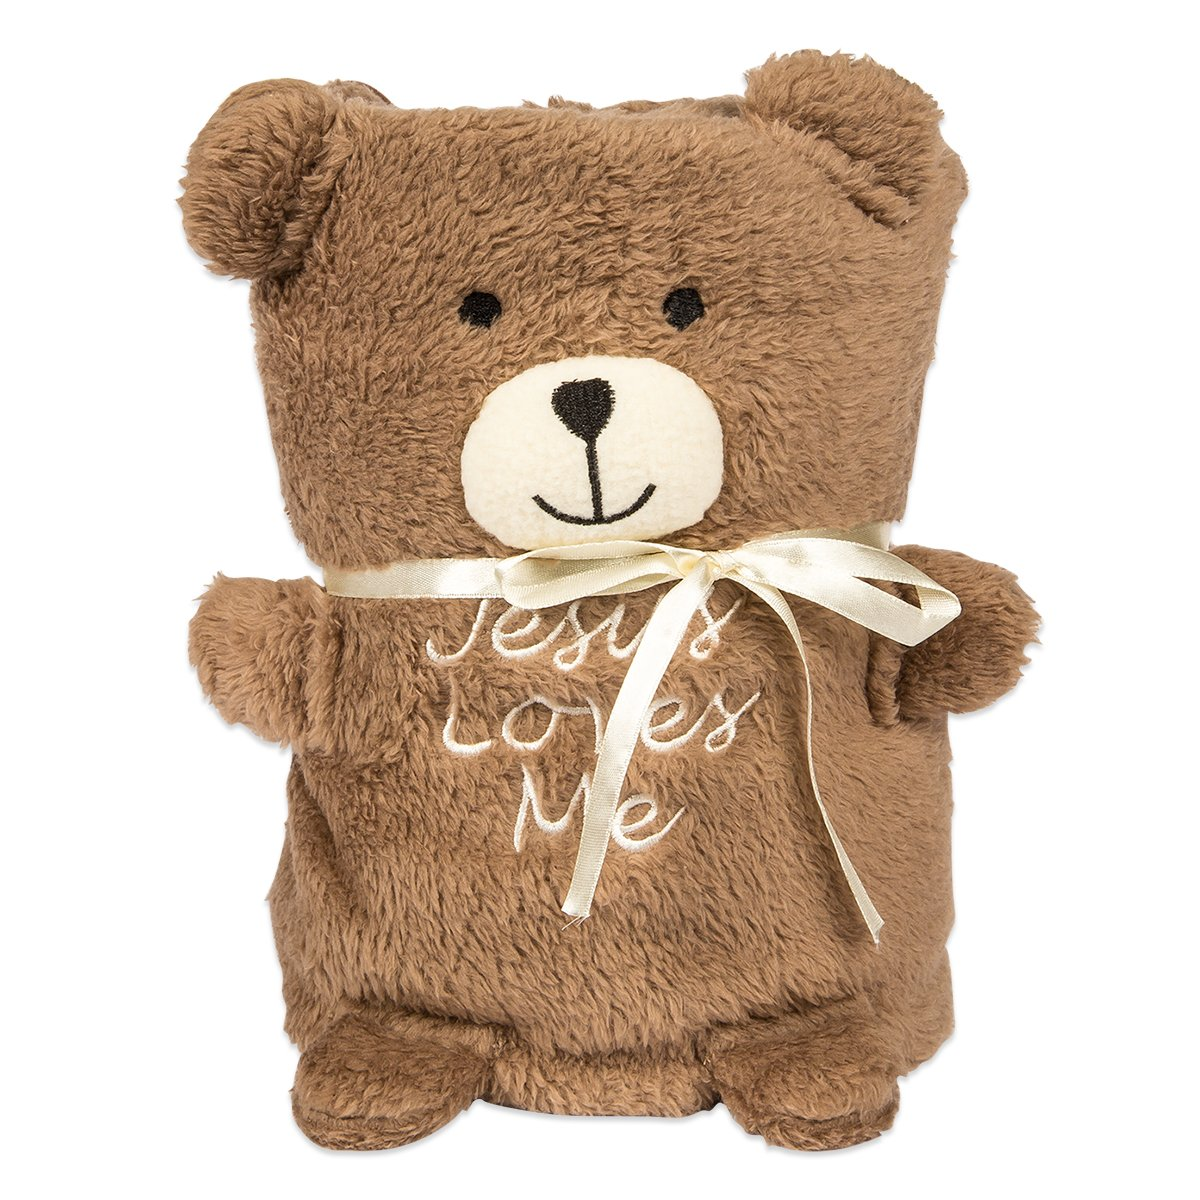 Brownlow Gifts Jesus Loves Me Blankie, Teddy Bear by Brownlow Gifts